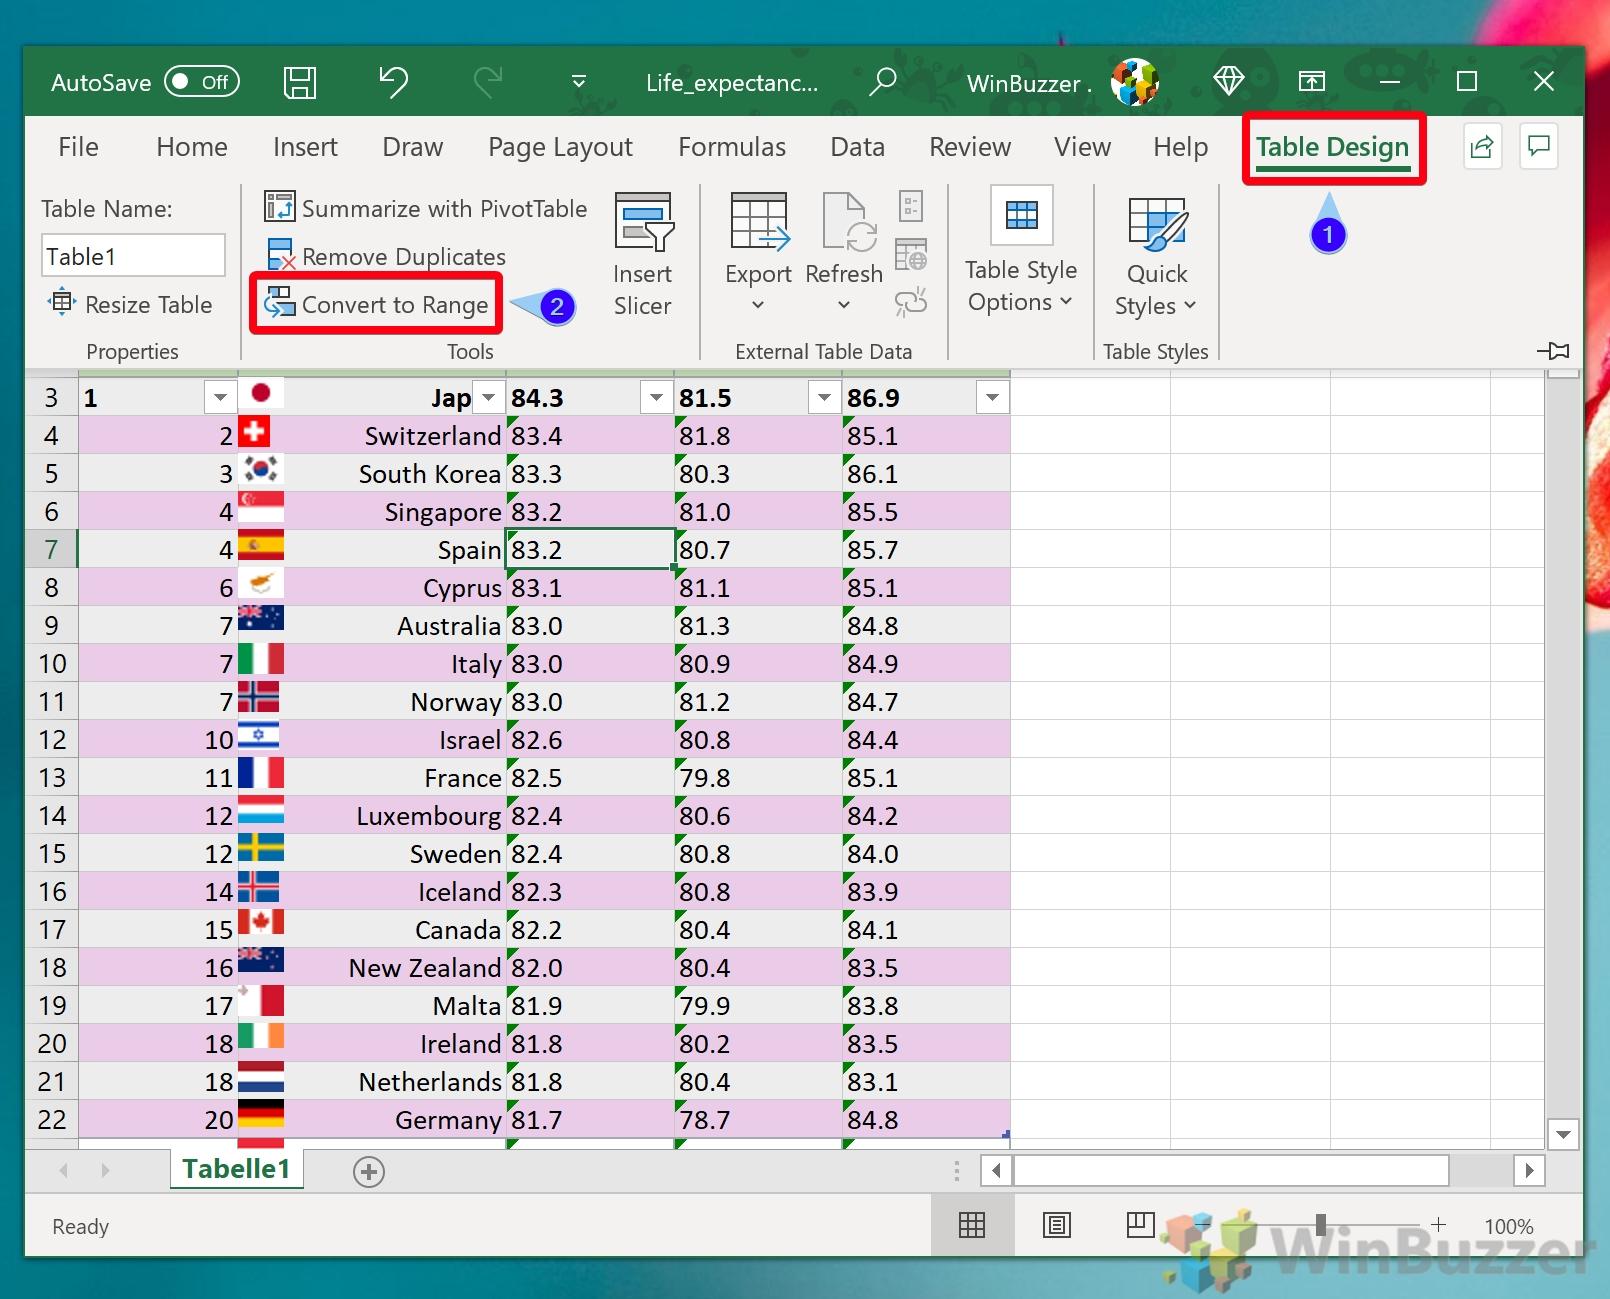 Windows 10 - Excel - Table Design - Convert to Range